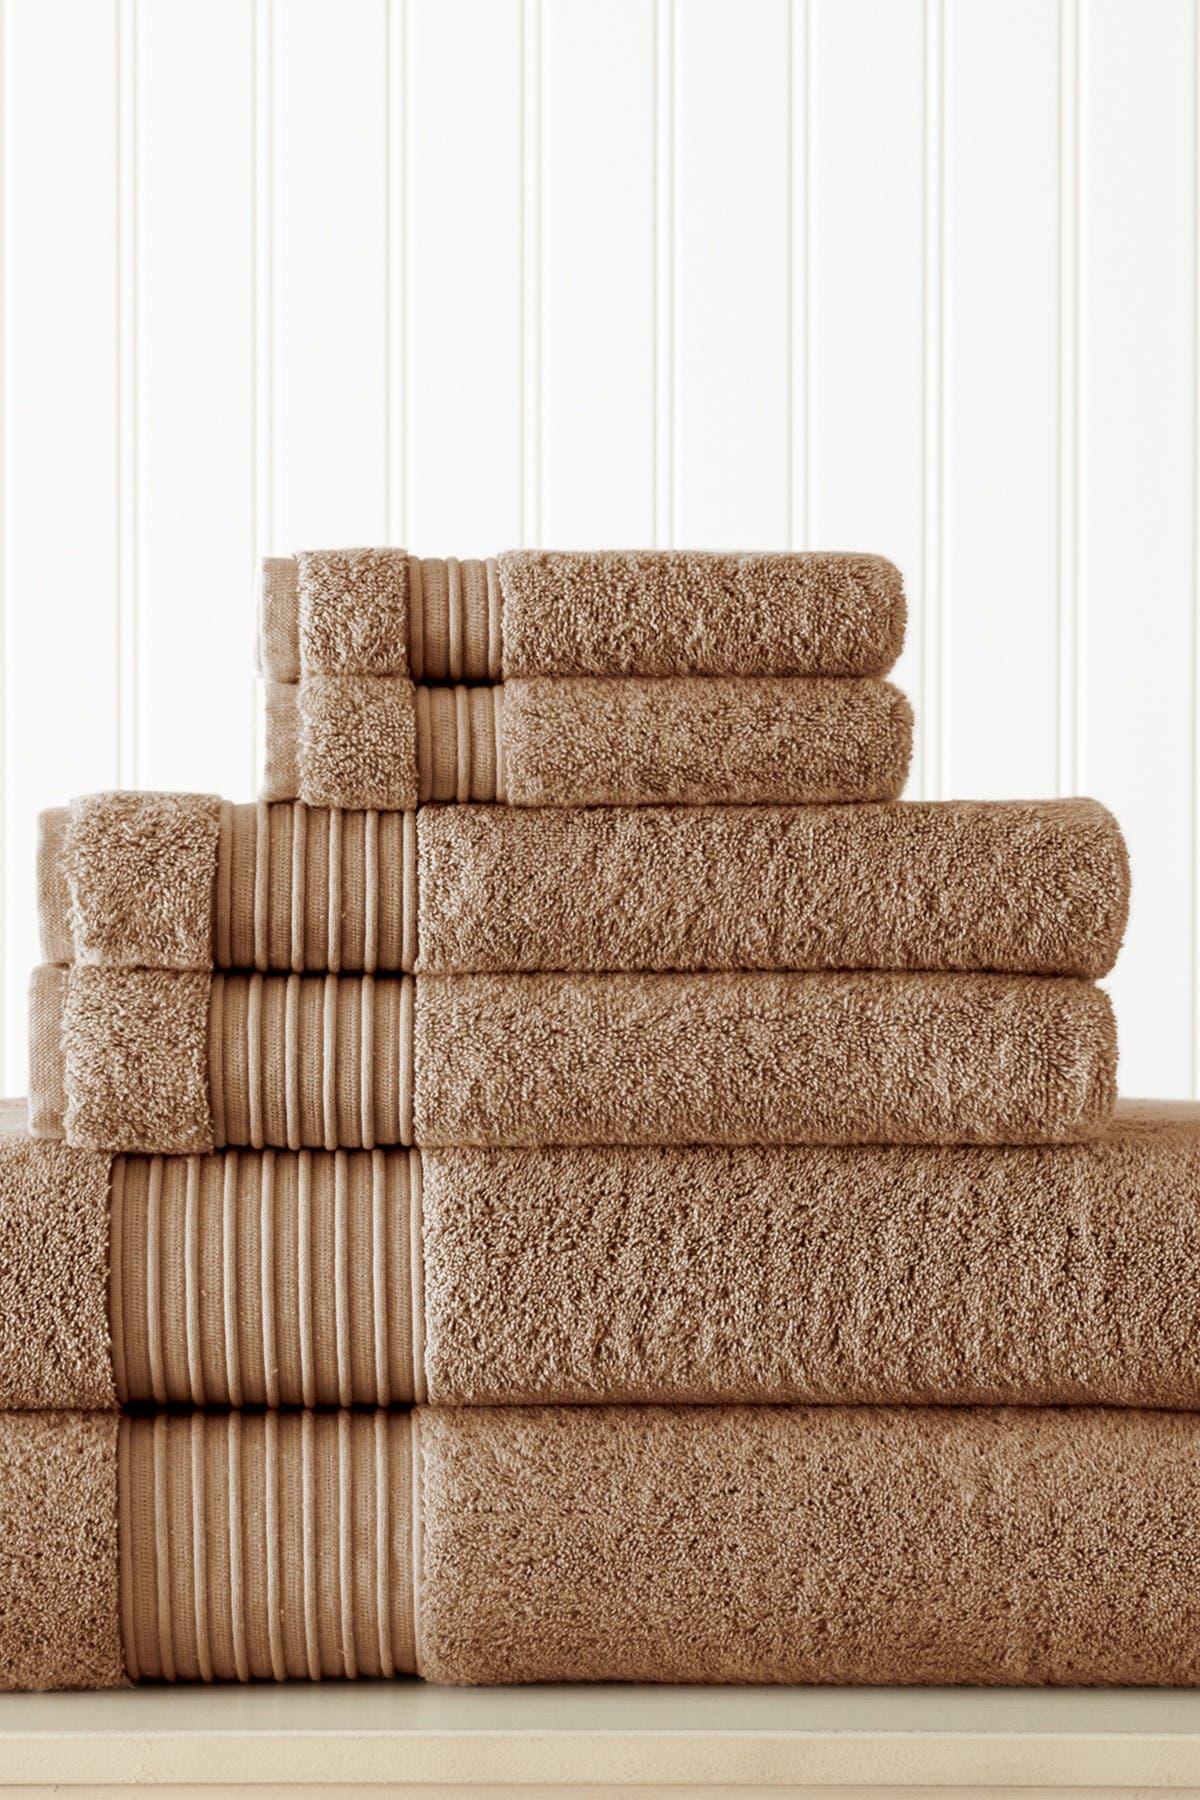 Image of Modern Threads 6-Piece Turkish Cotton Towel Set - Mocha